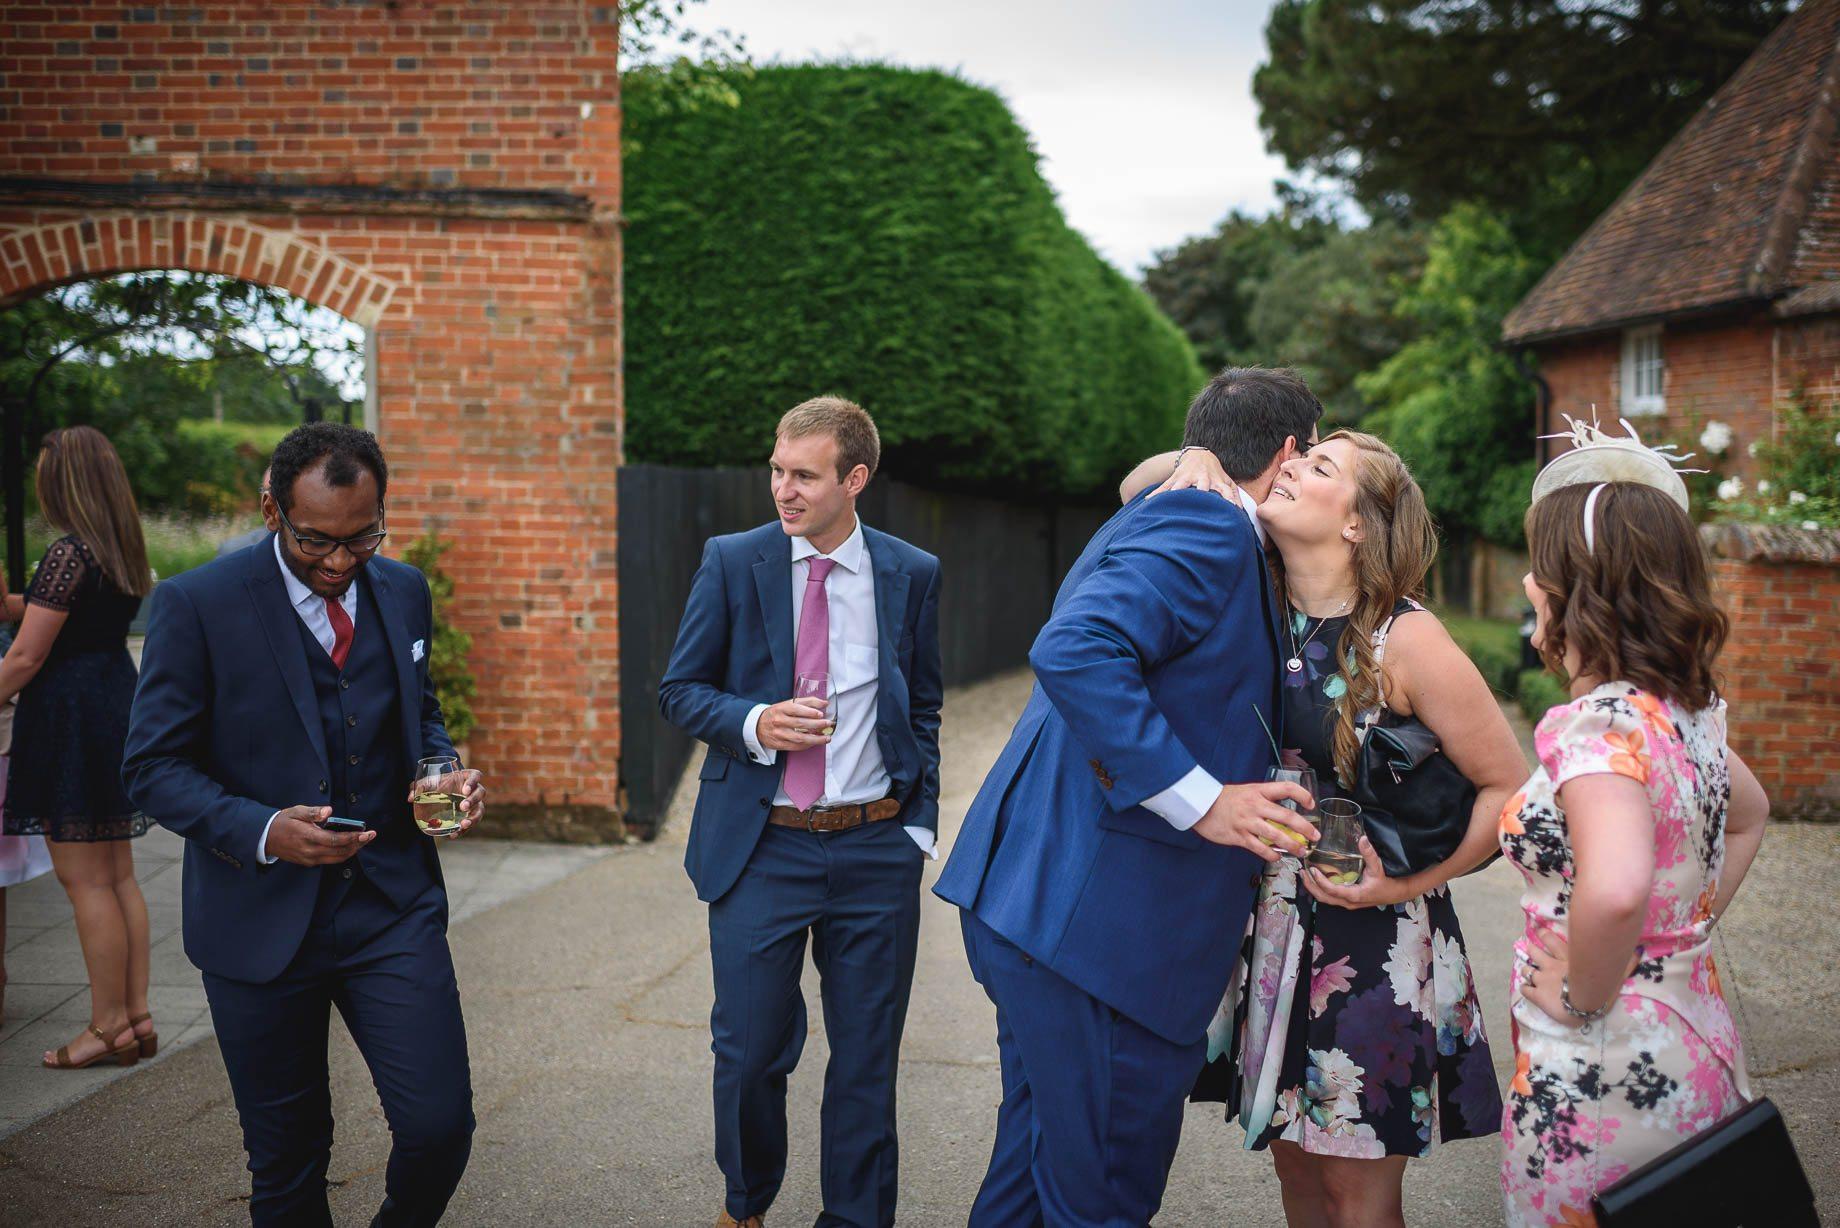 Gaynes Park wedding photography - Guy Collier Photography - Rachel and Jon (106 of 169)